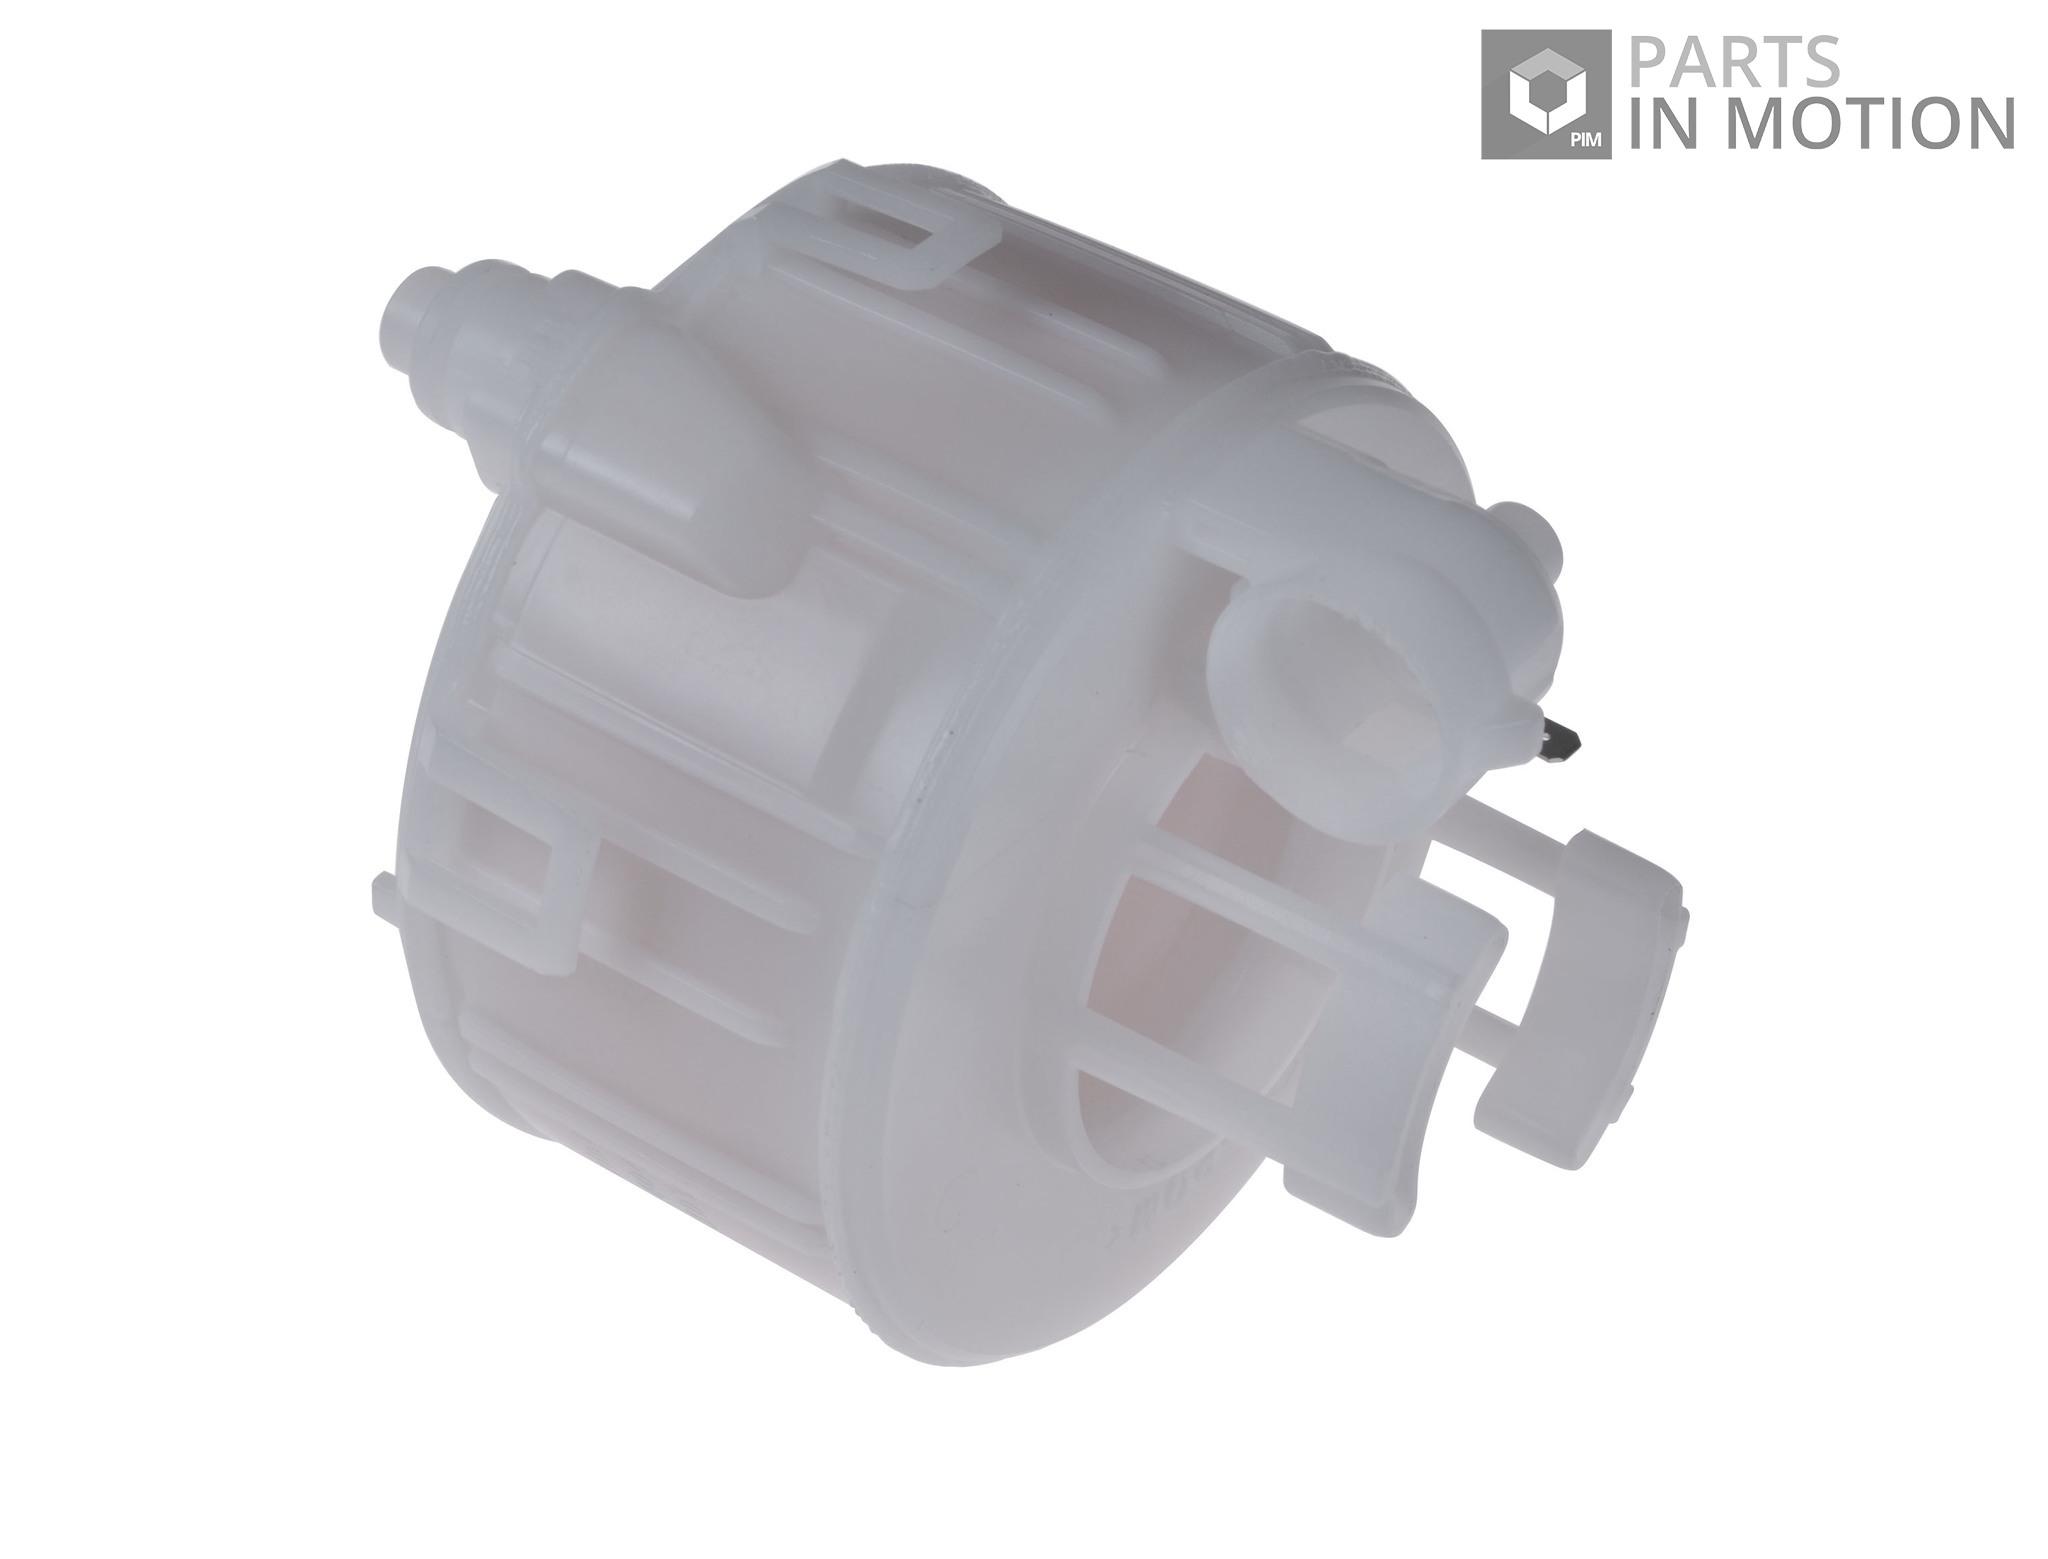 Fuel Filter In Tank Adg02404 Blue Print 311121r000 Genuine Quality 2012 Kia Sorento 2